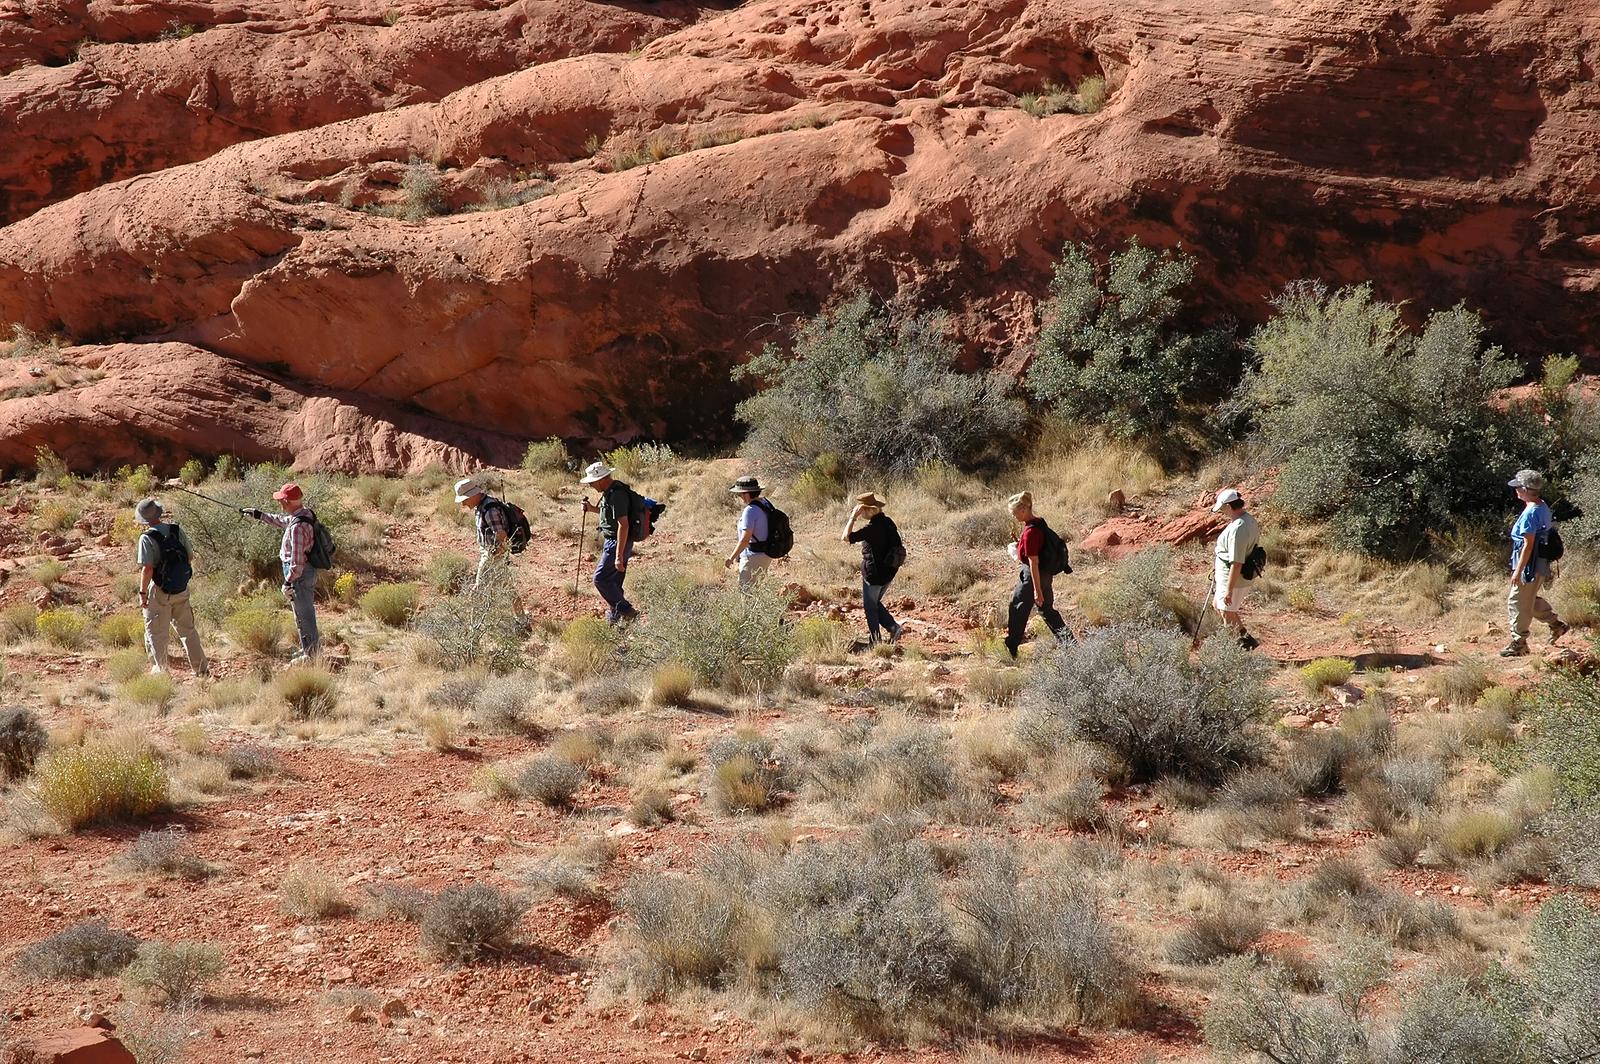 bigstock-A-group-of-hikers-in-Nevada-de-27331886.jpg